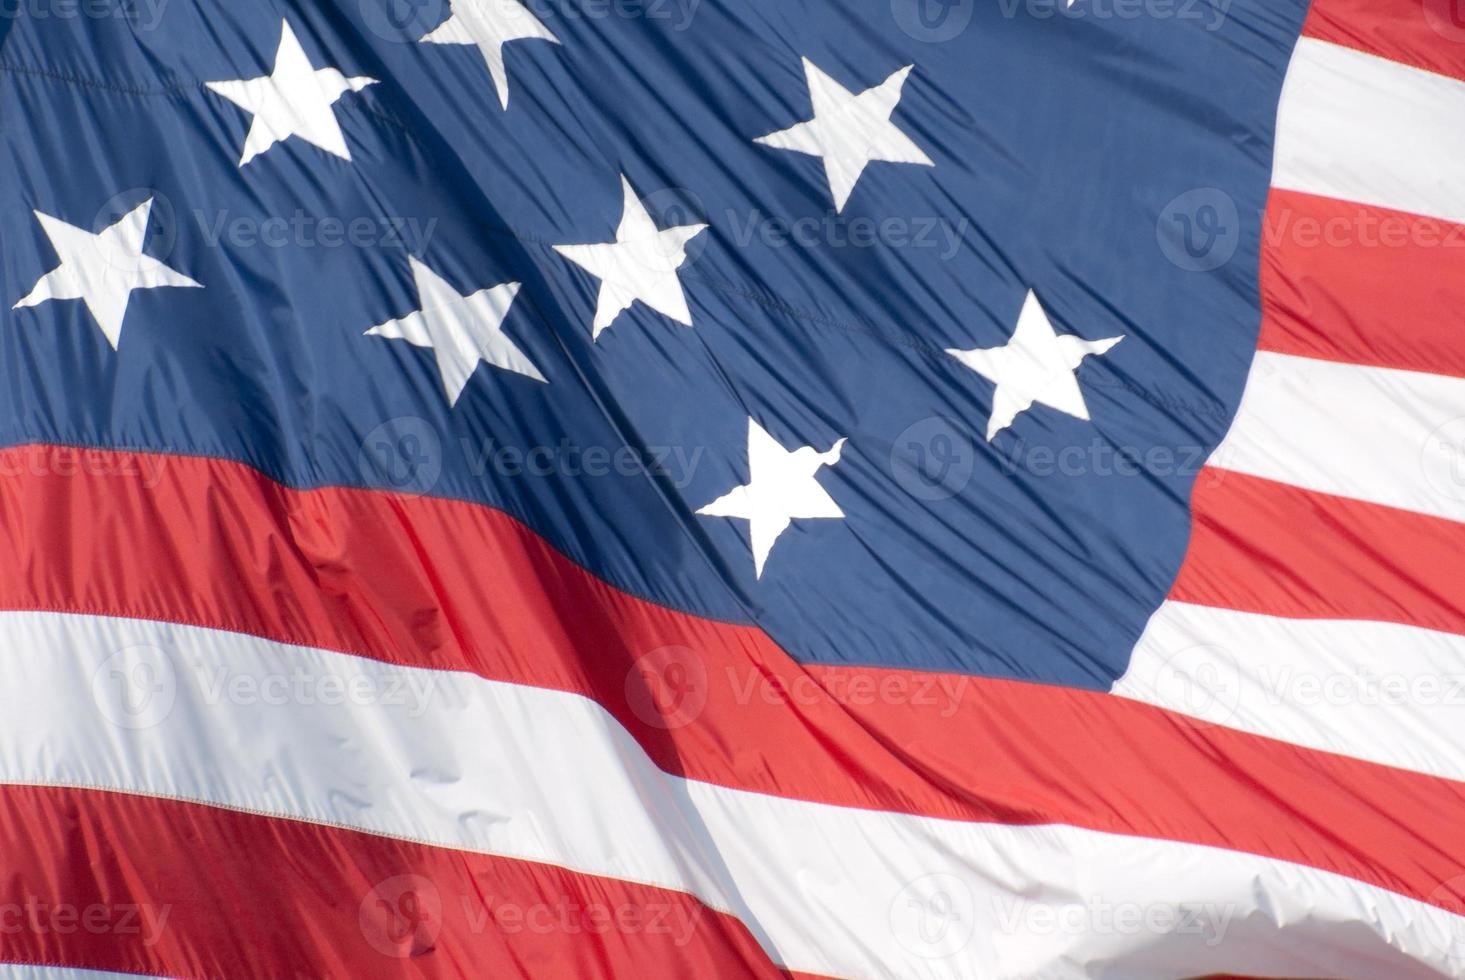 la stella spangled bandiera banner - baltimore, maryland foto